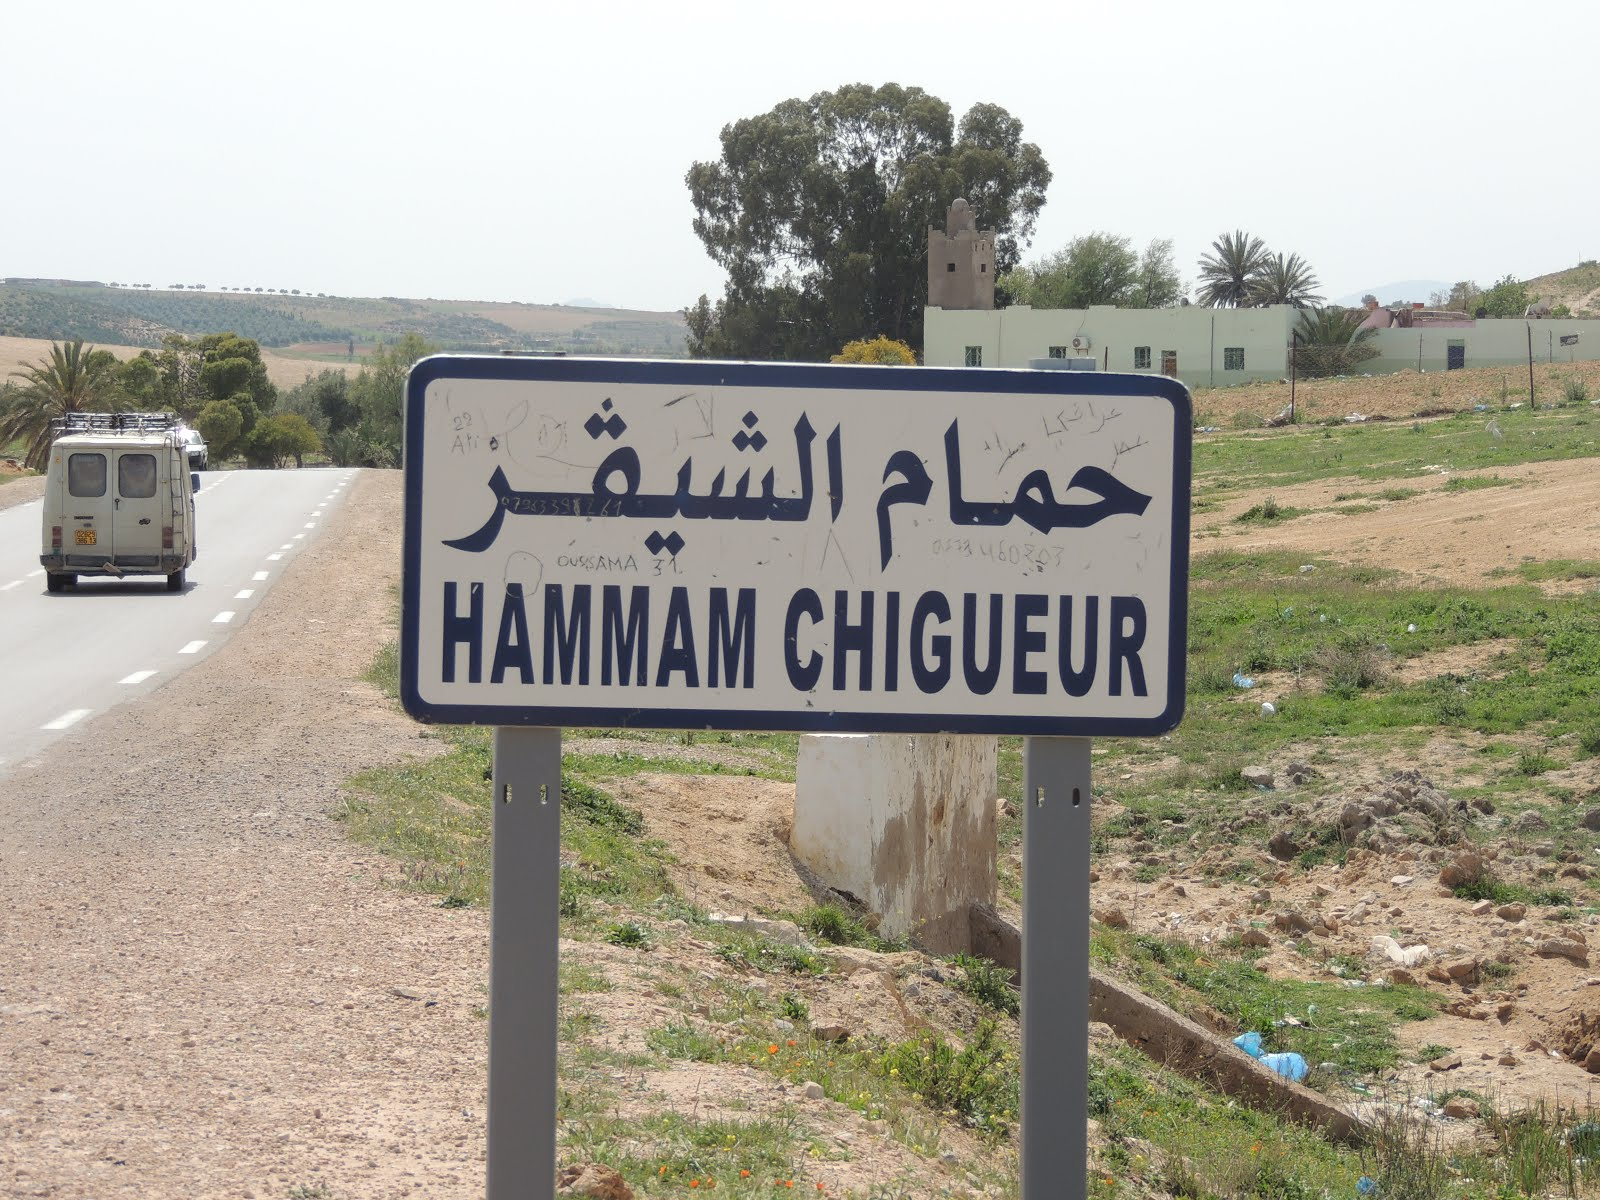 HAMMAM CHIGER